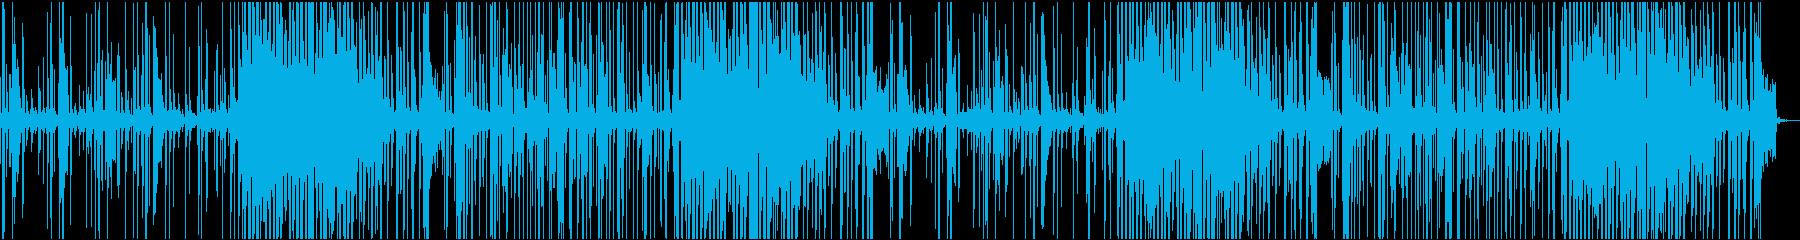 Vlog、実況、説明、商品紹介系BGM4の再生済みの波形